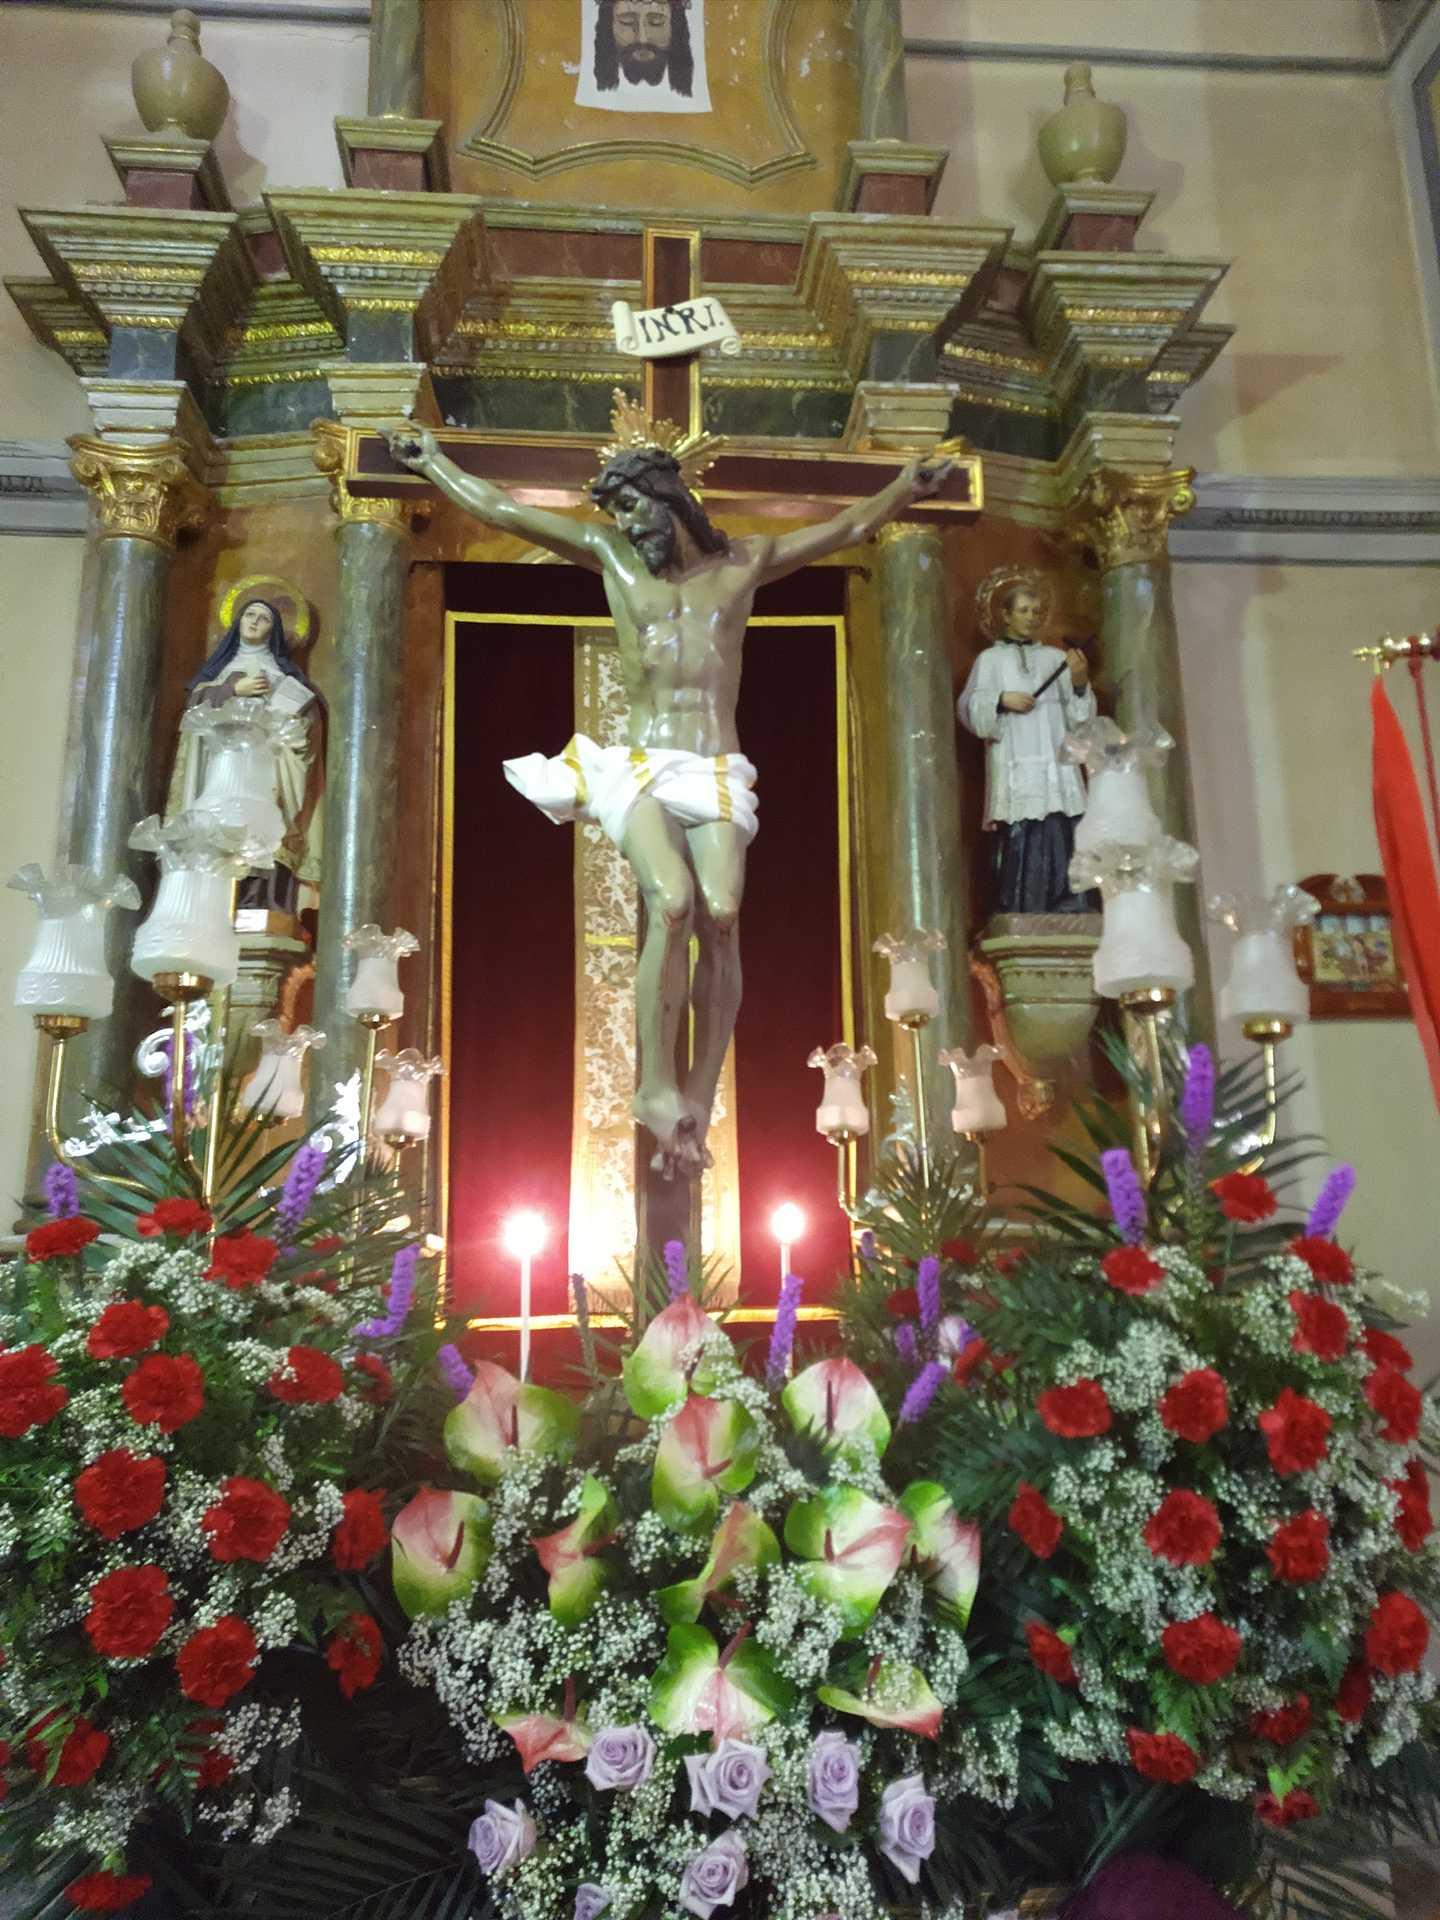 FESTIVITAT DEL SANTÍSIMO CRIST DE LA CLEMENCIA